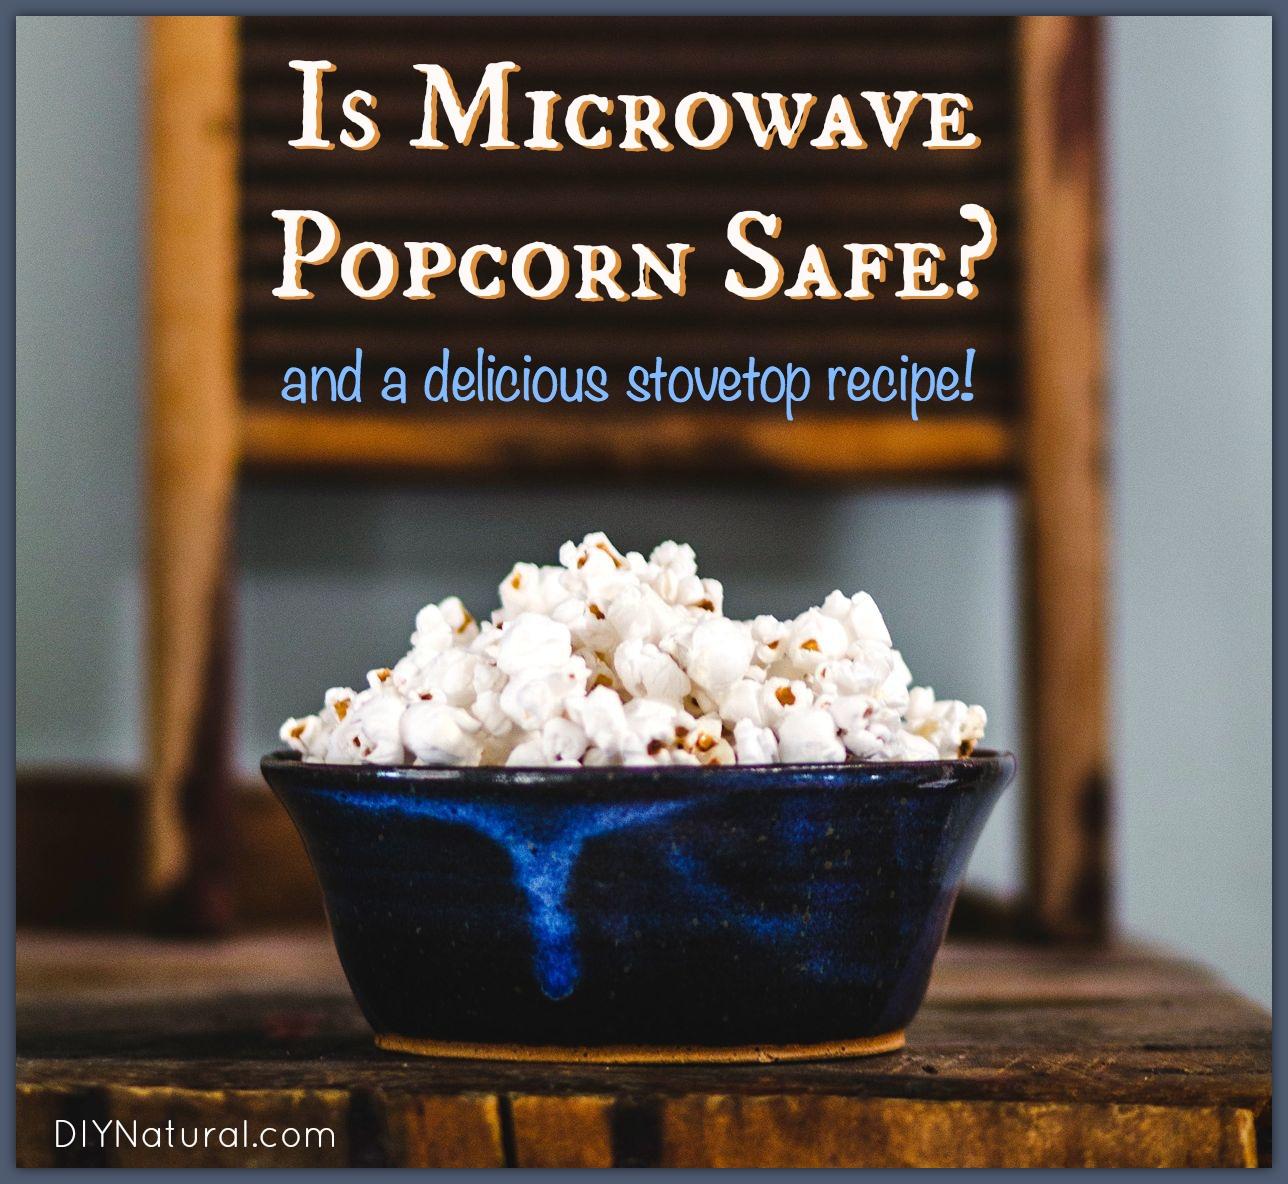 microwave popcorn dangers a popcorn